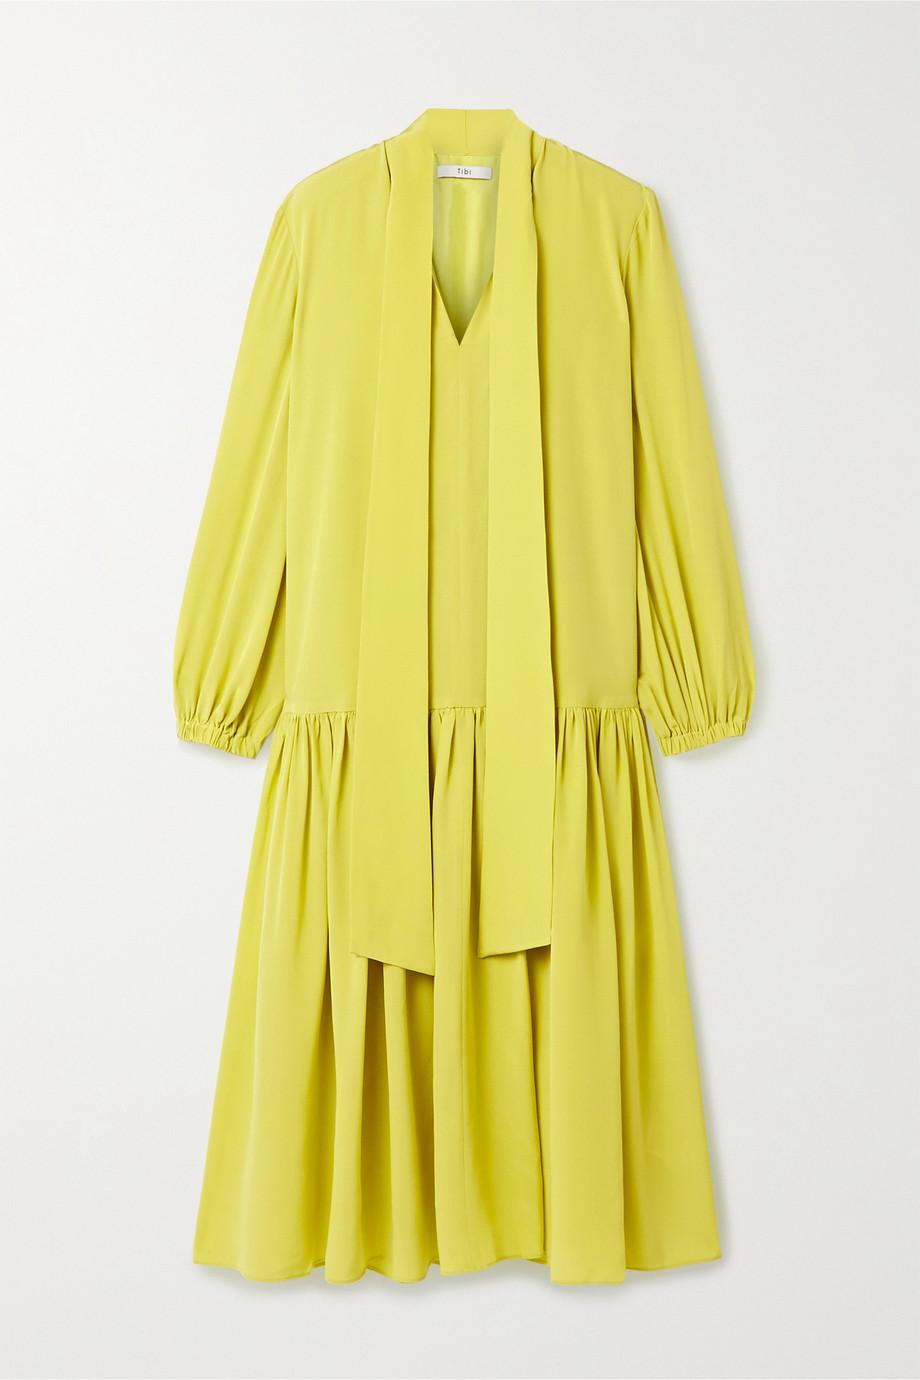 Tibi Tie-neck silk crepe de chine midi dress